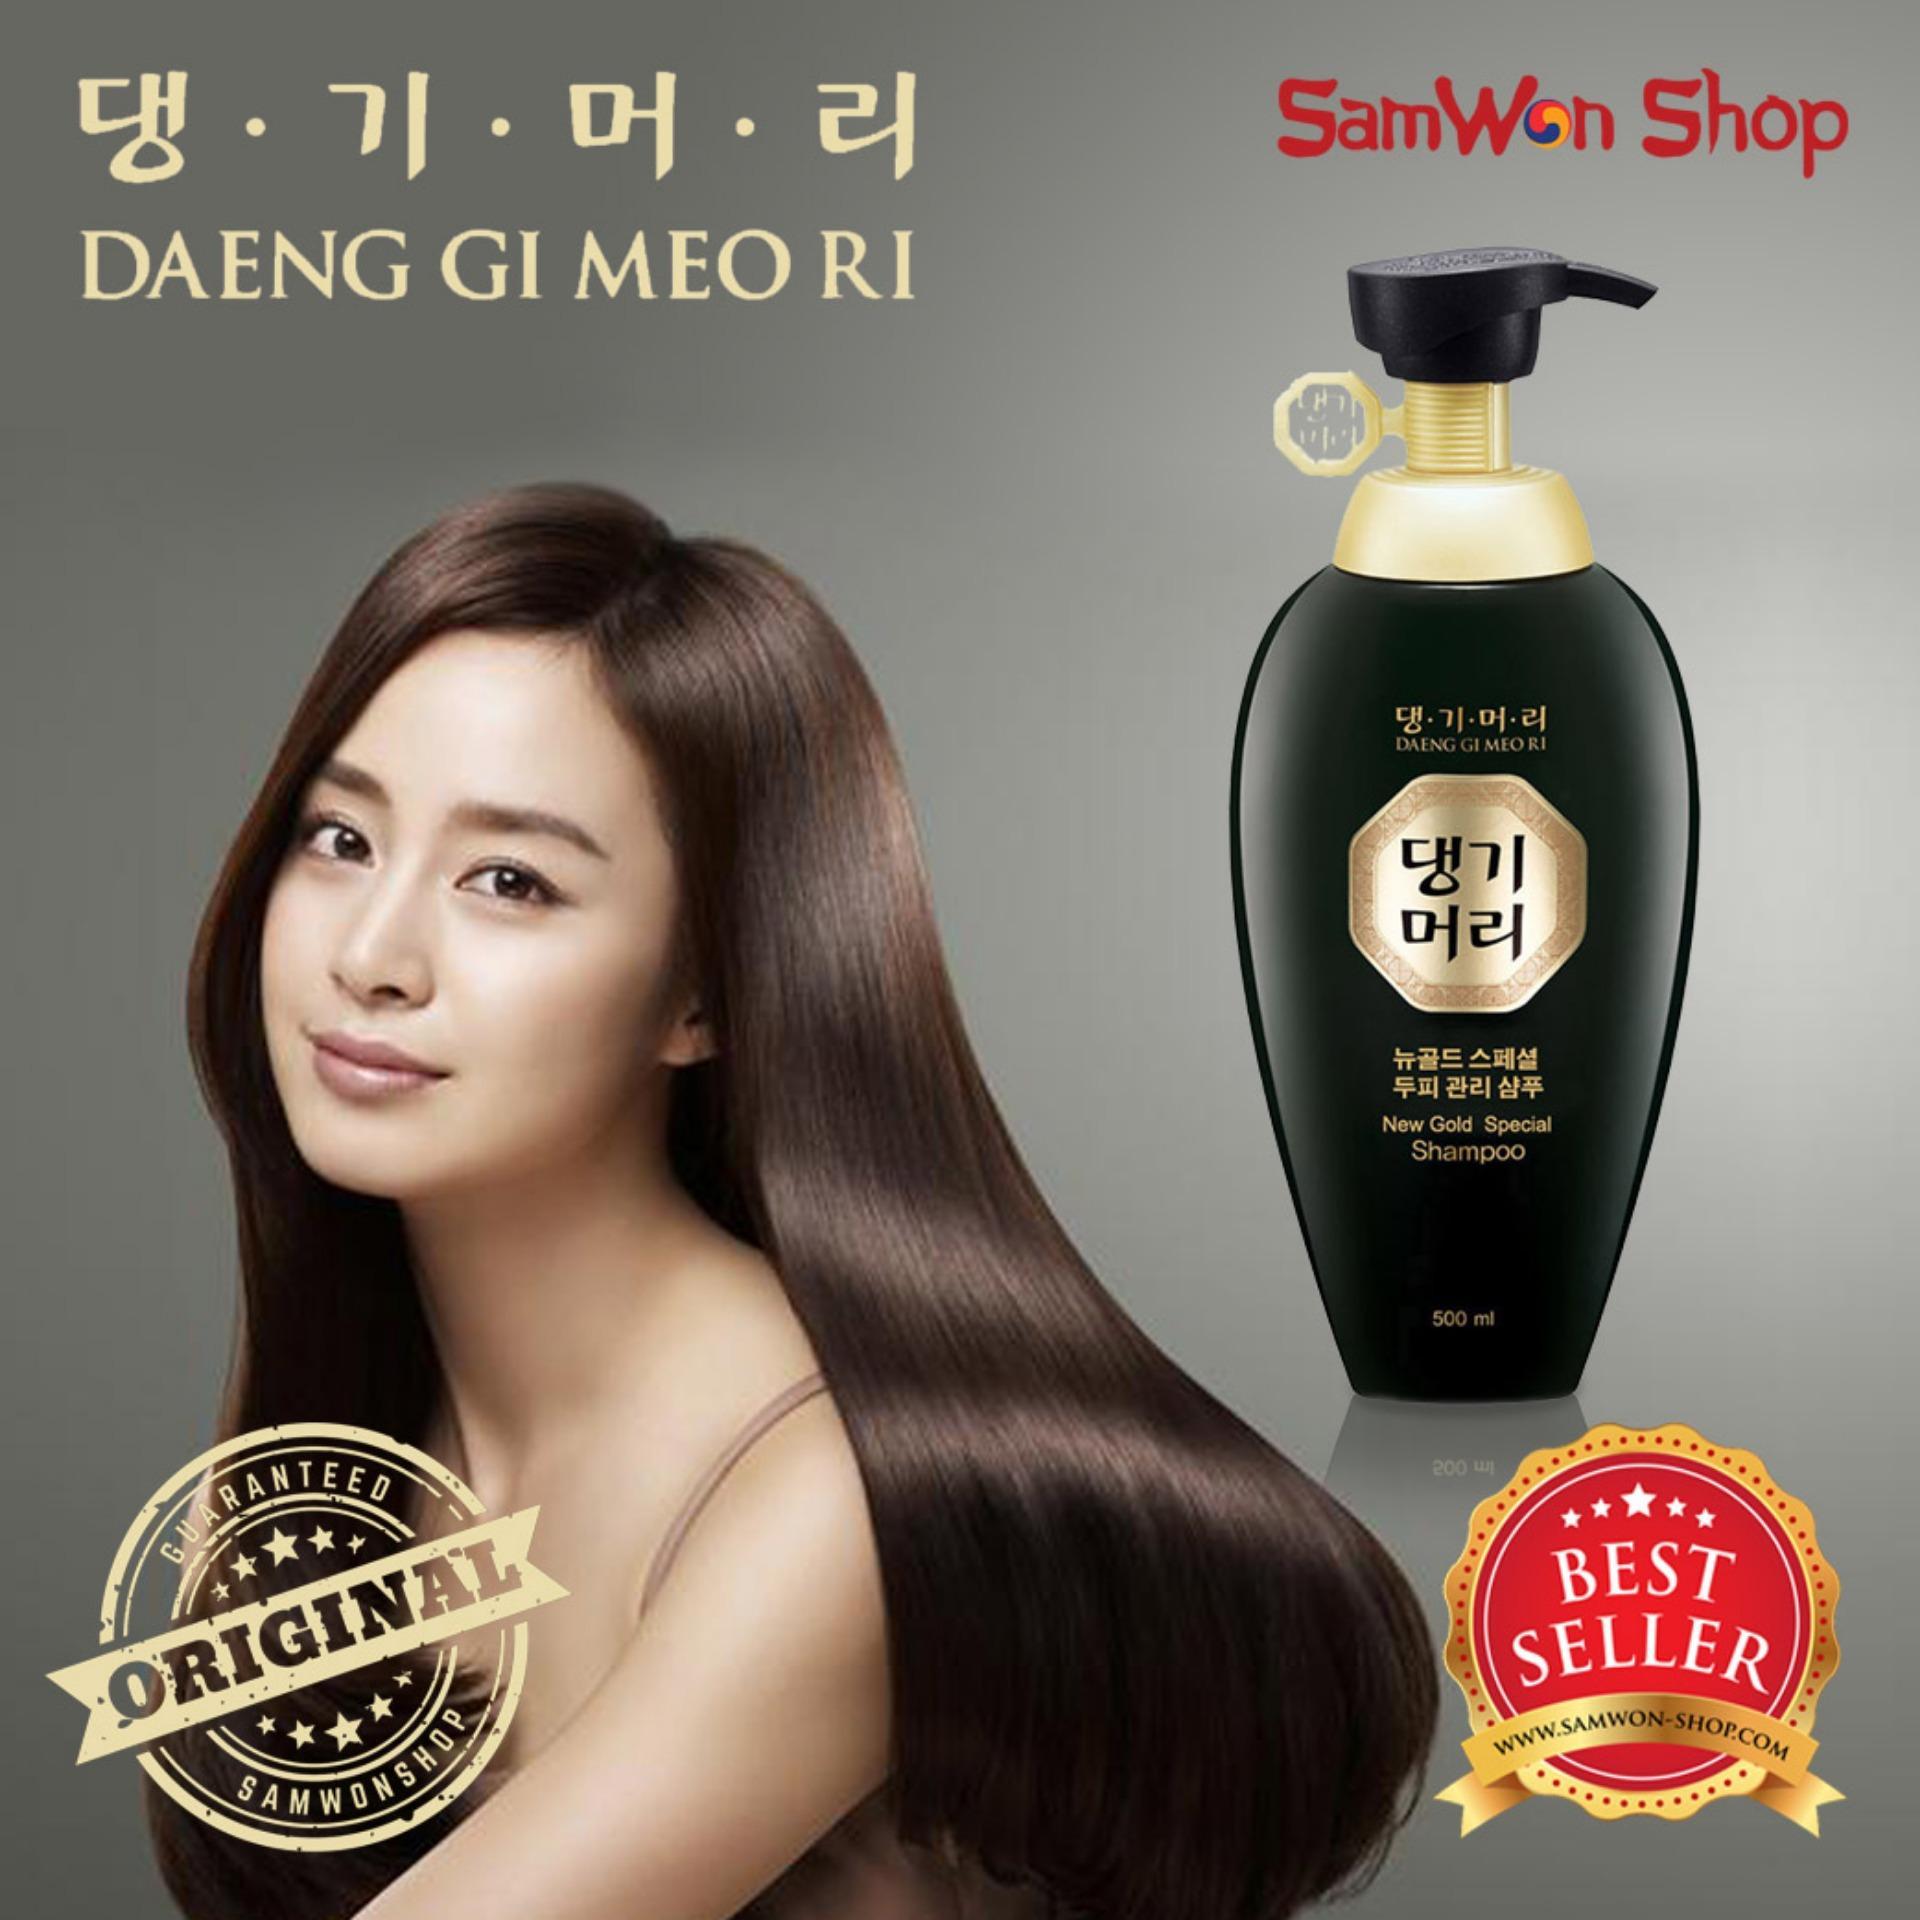 List Harga Bsn Noni Shampoo Natural Black Box Isi 20 Sachet 20ml Shampo Daeng Gi Meo Ri New Gold Original Lejel Per